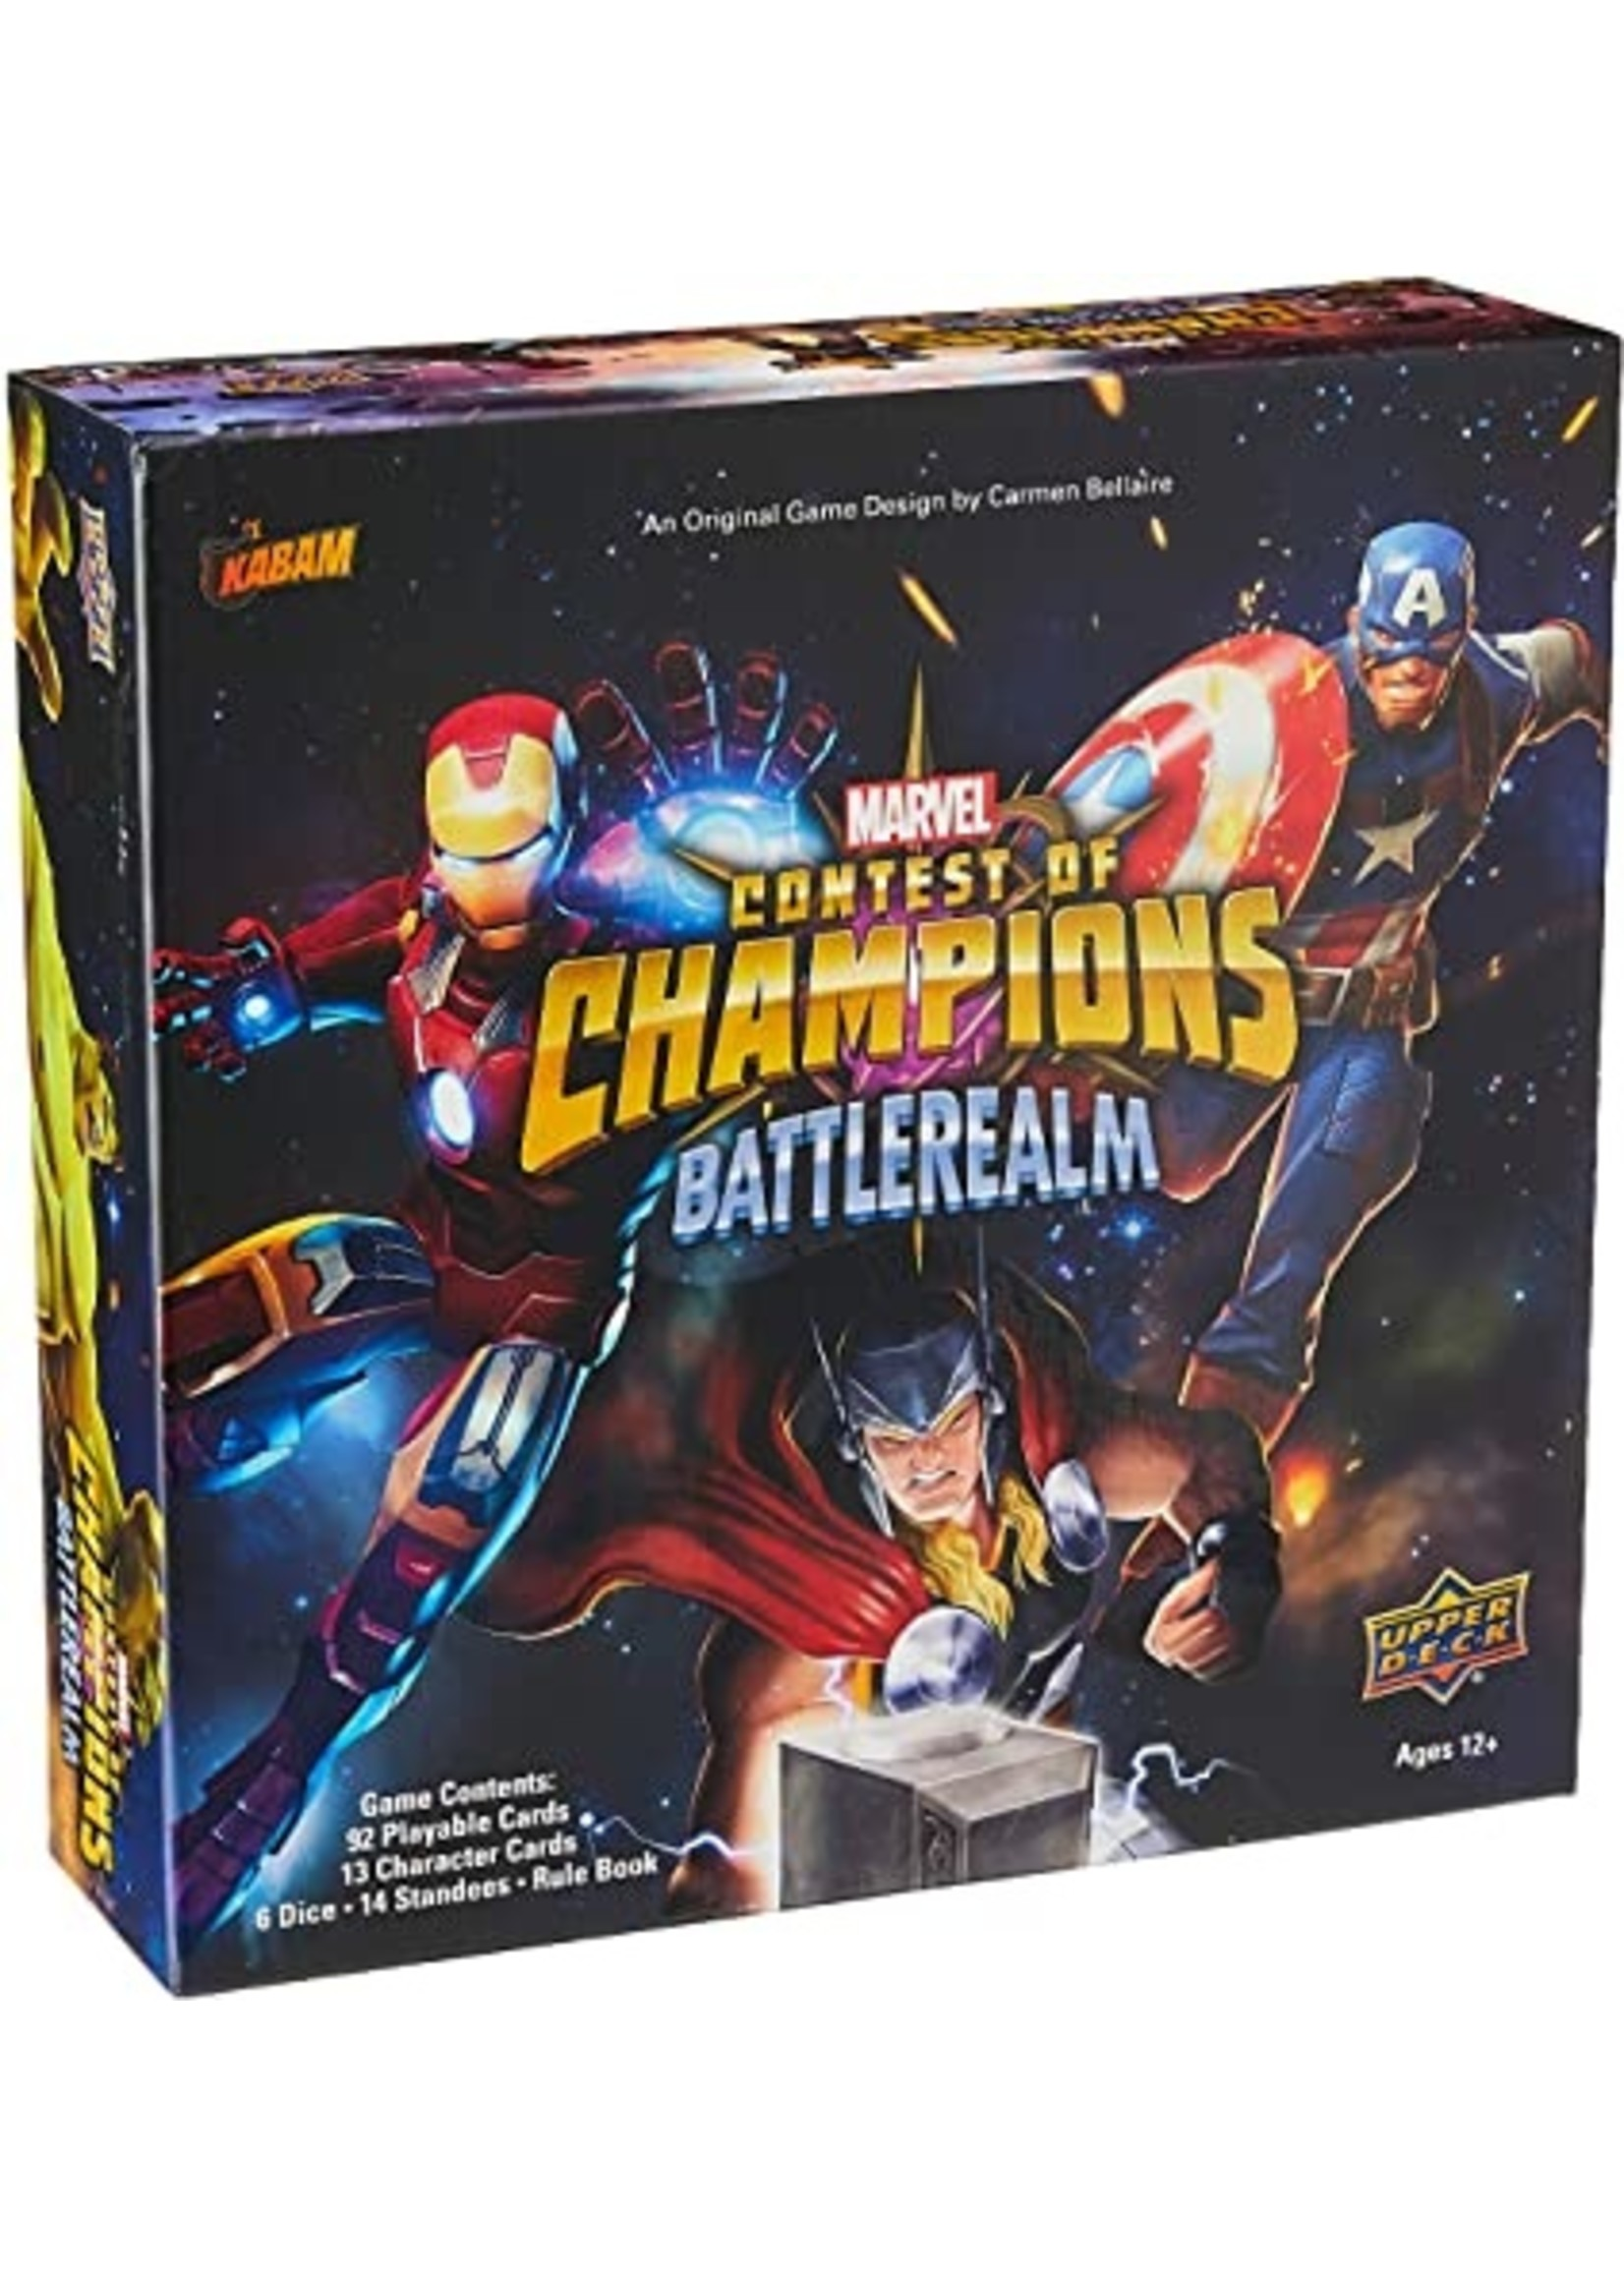 Marvel Contest of Champions Battlerealm